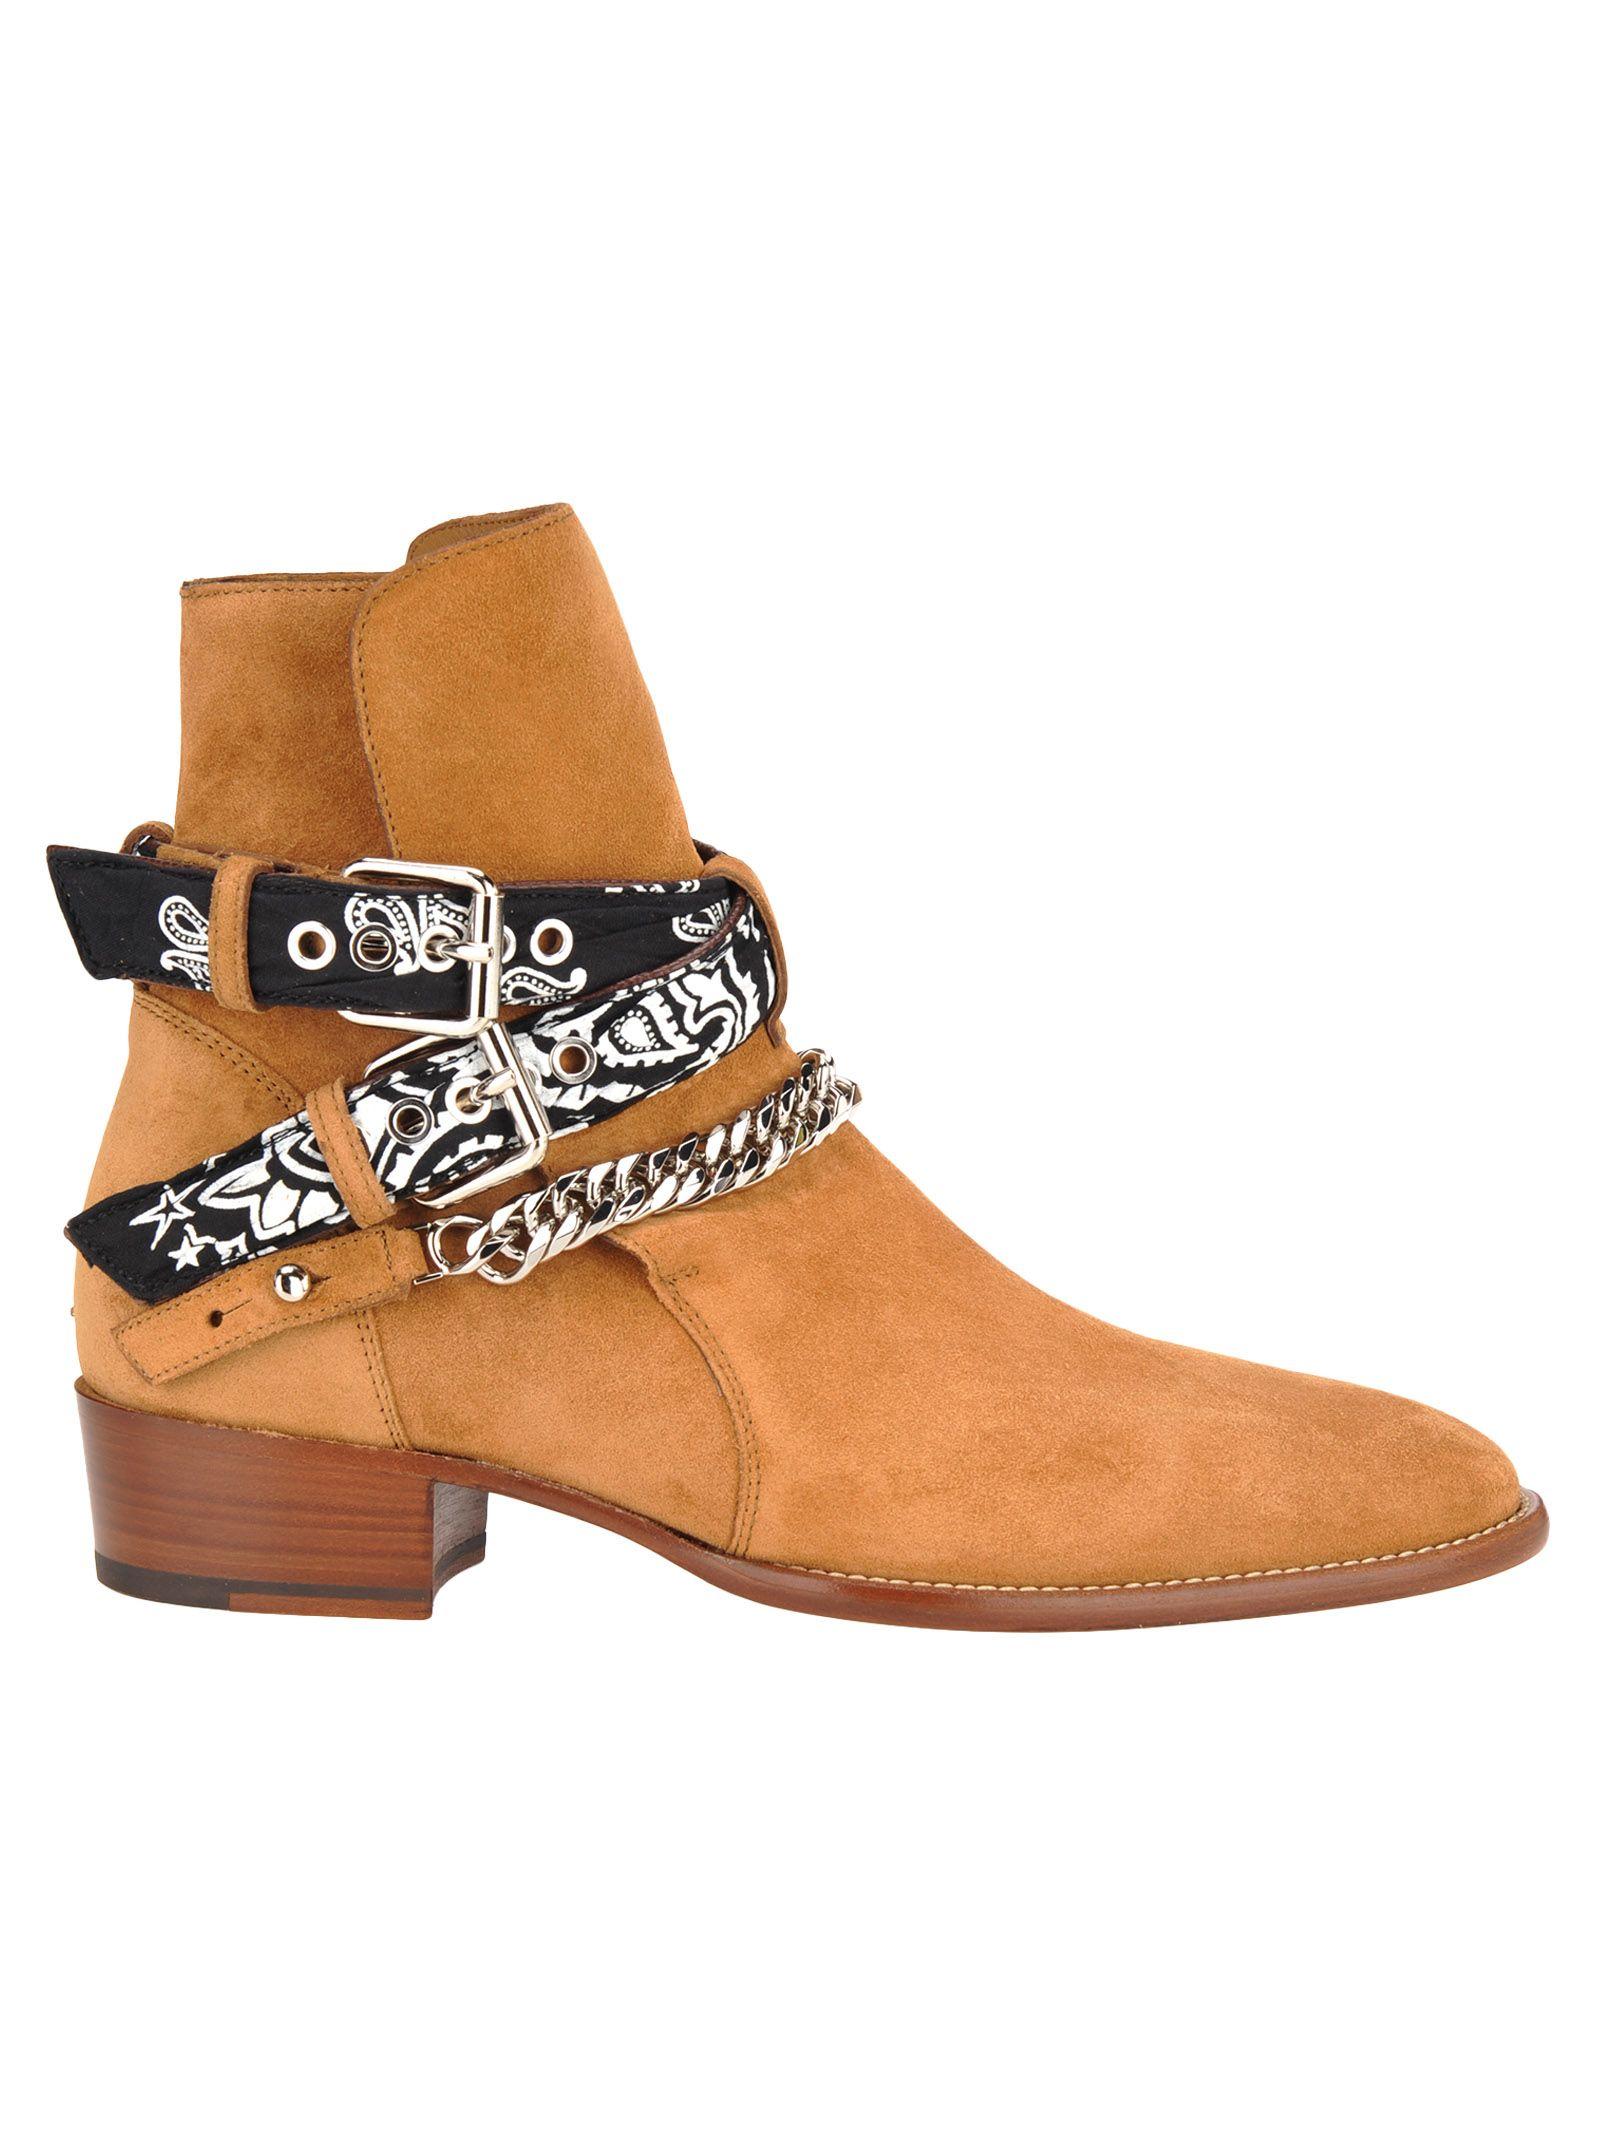 Amiri Amiri Bandana Buckle Boot Brown 10873209 Italist